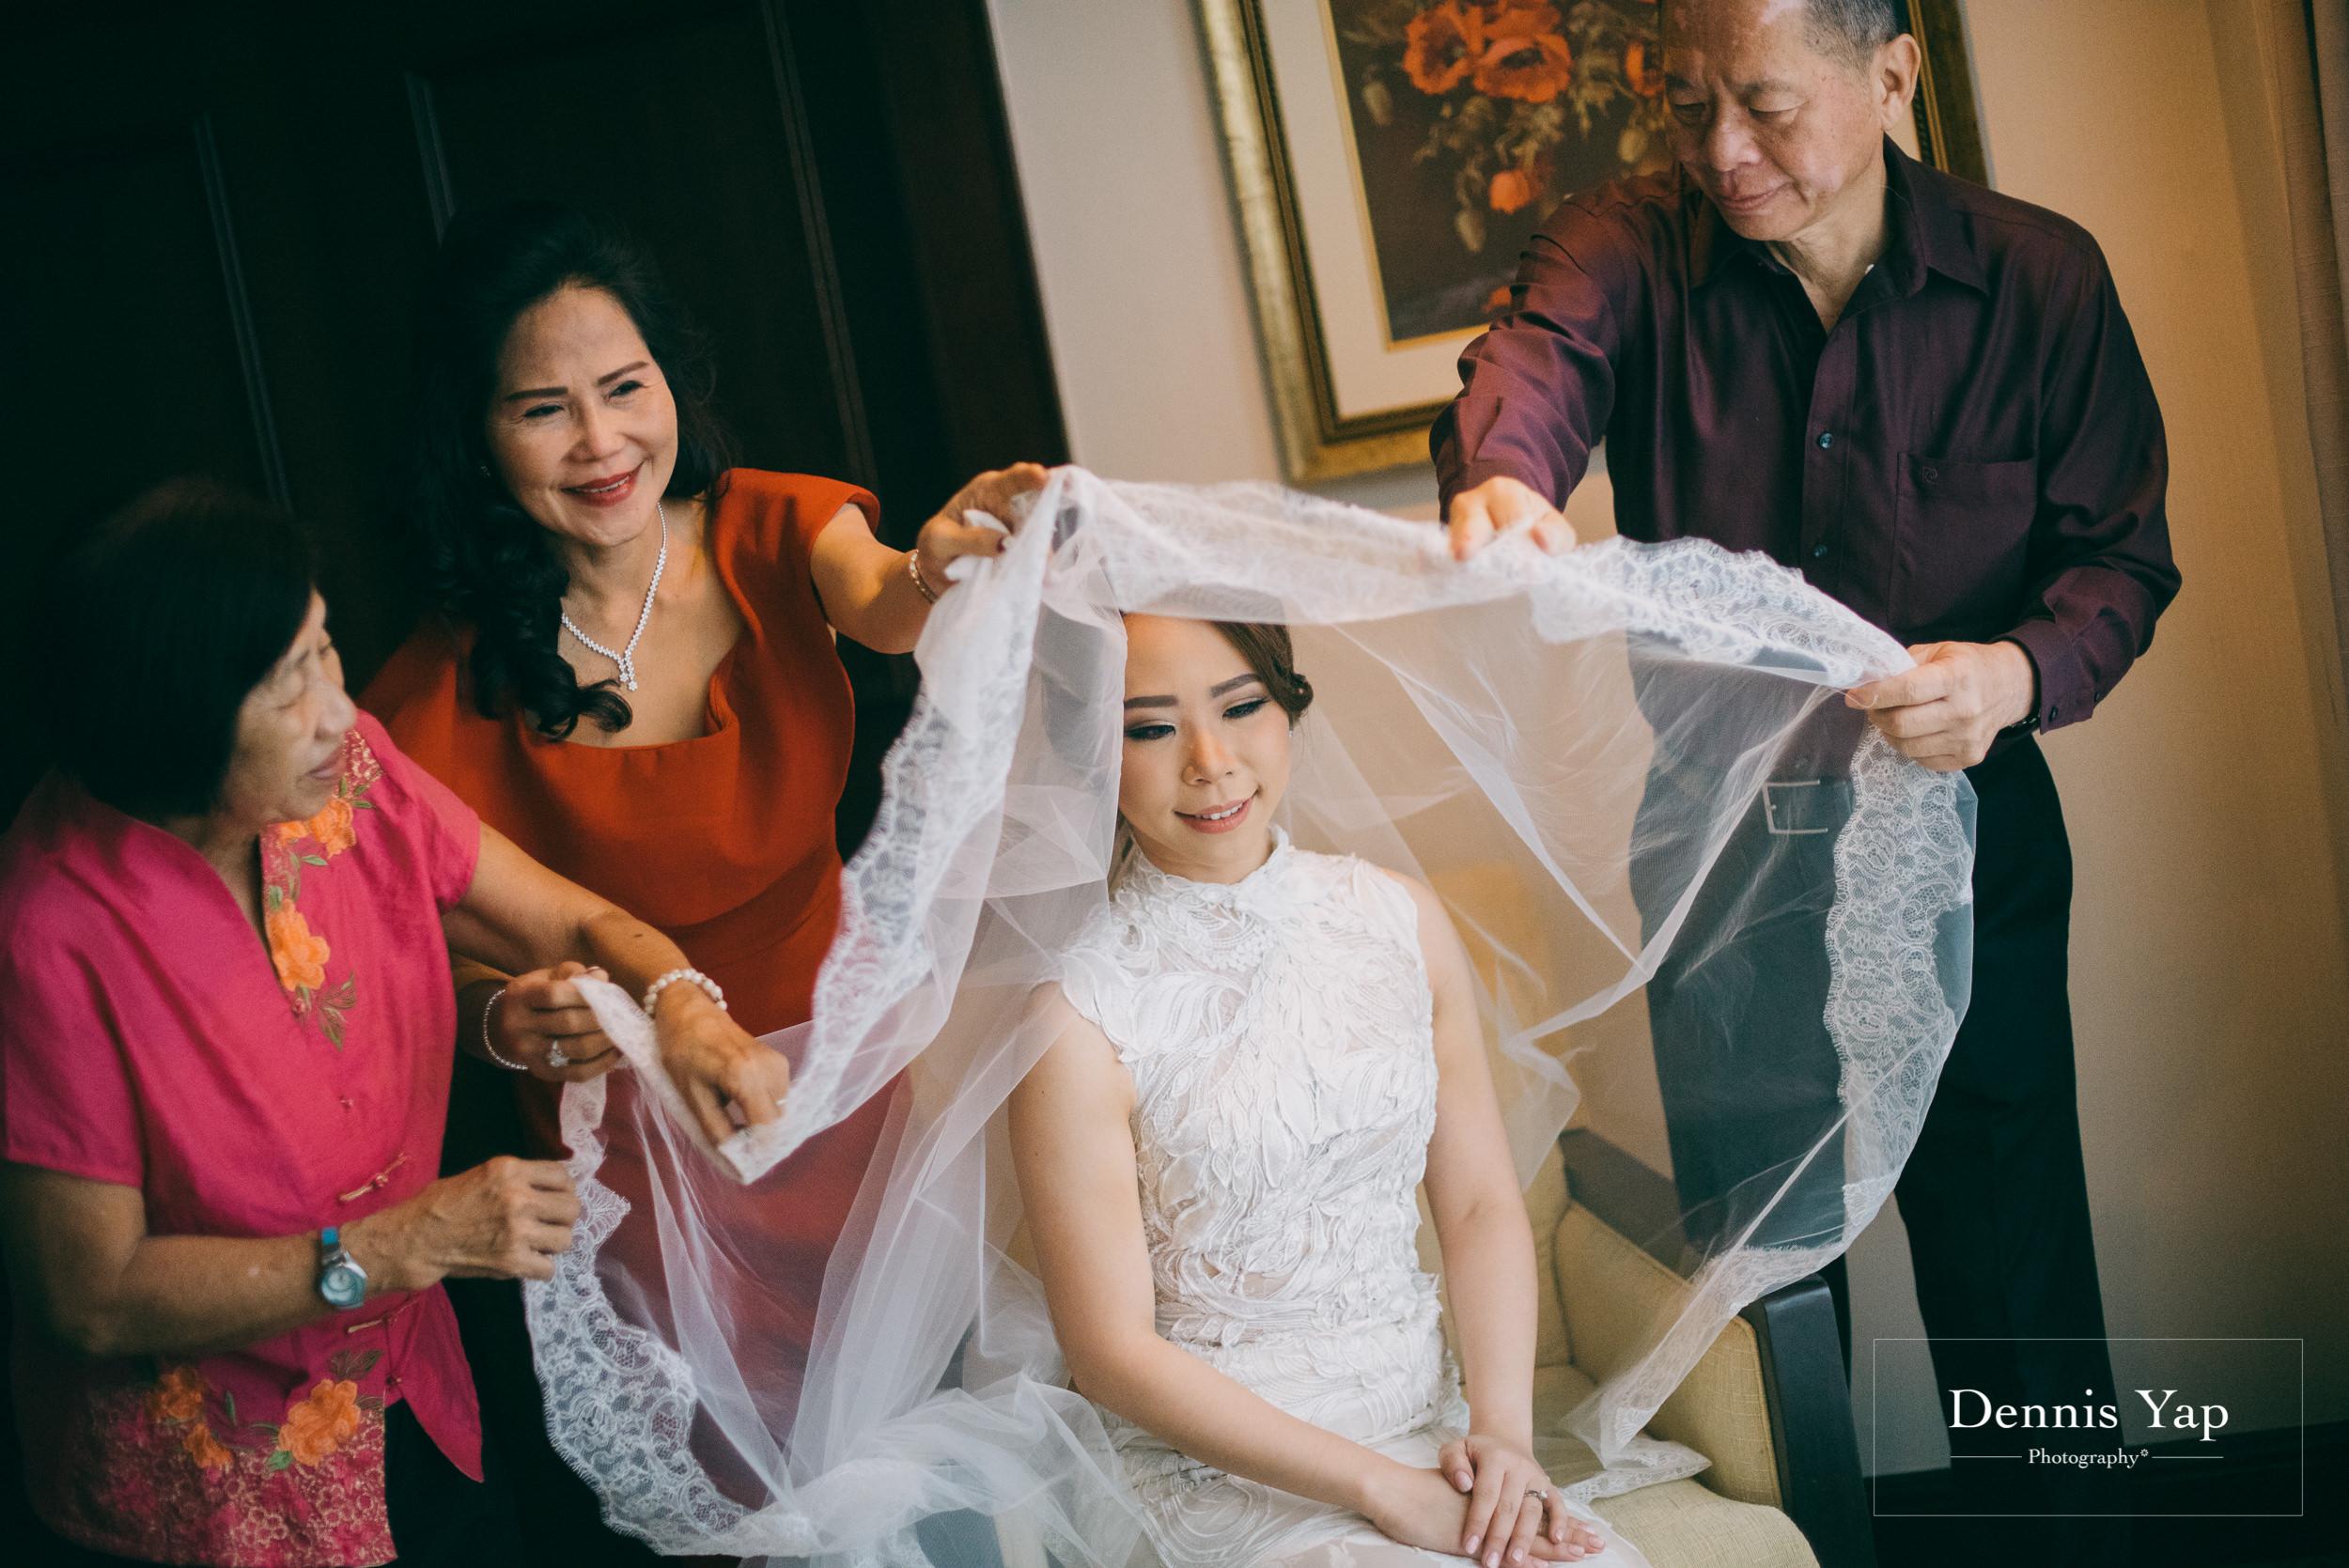 keat mandy wedding day marriot putrajaya dennis yap malaysia wedding photographer-10.jpg